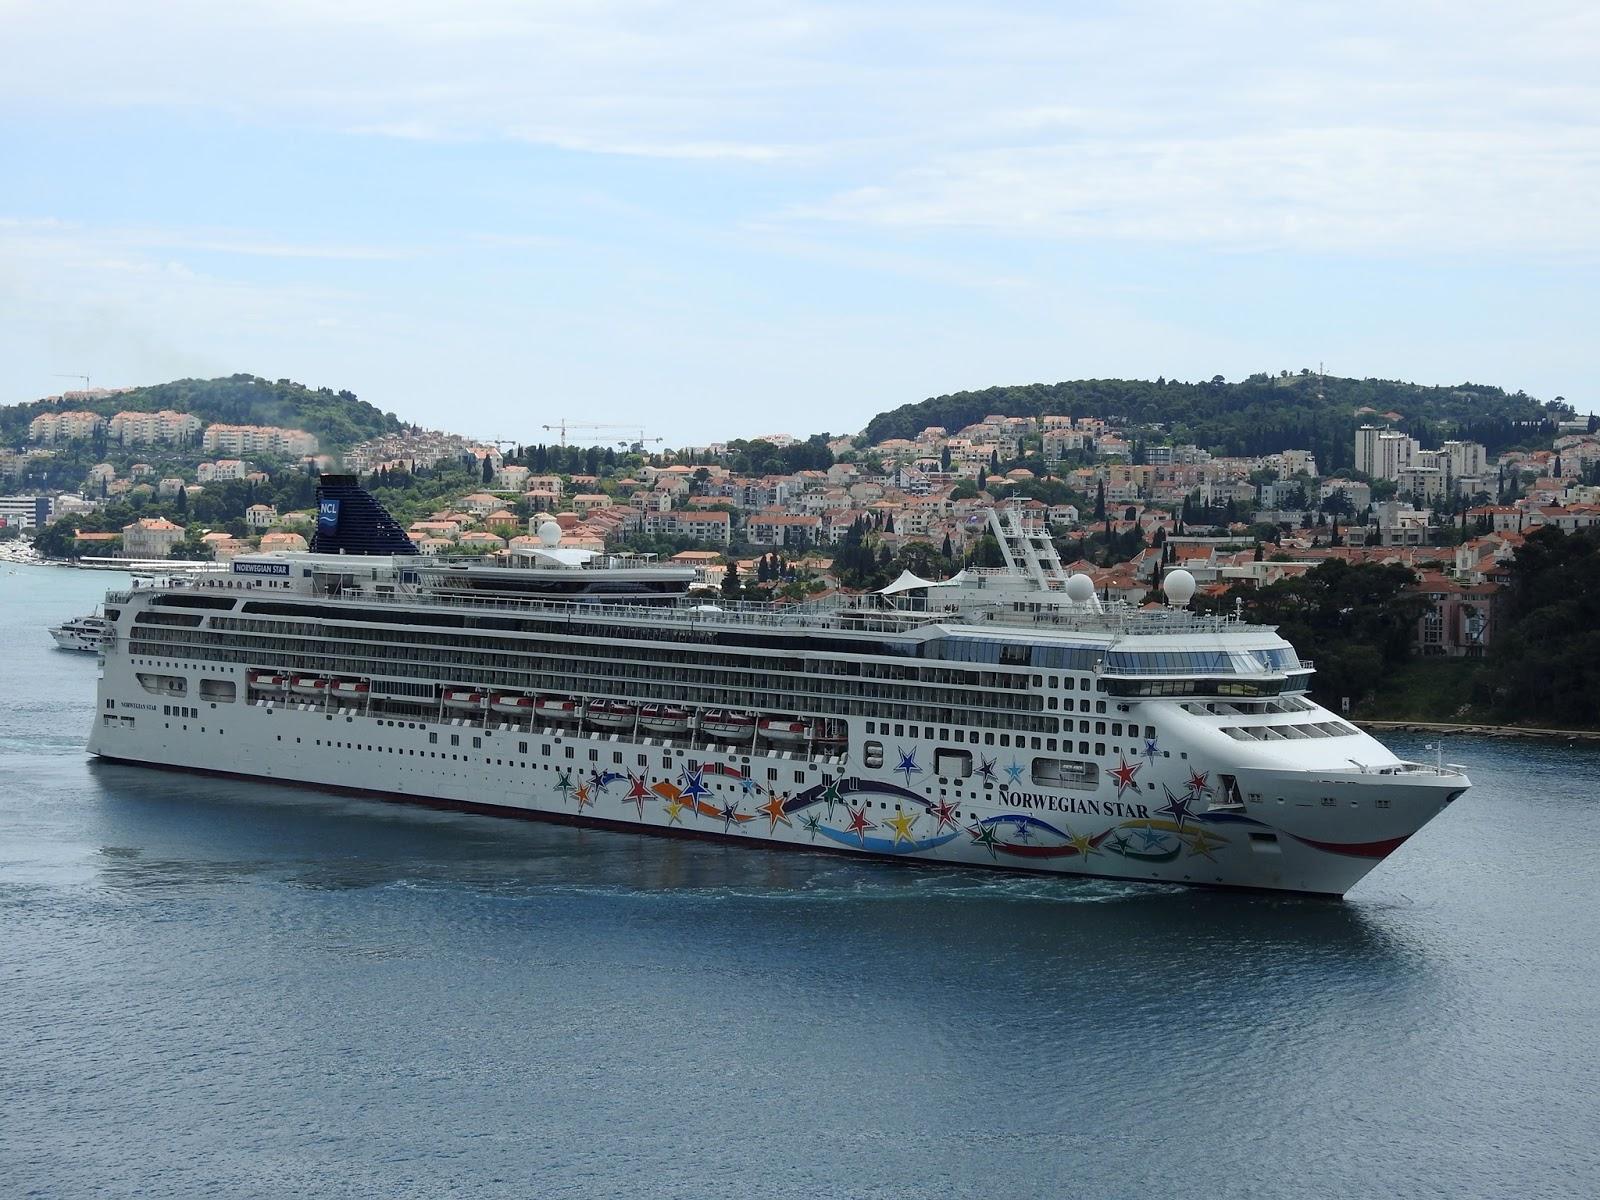 Francois Illas New Tradition: Sergio@Cruises: Dubrovnik Recebe Escala De Cinco Navios De